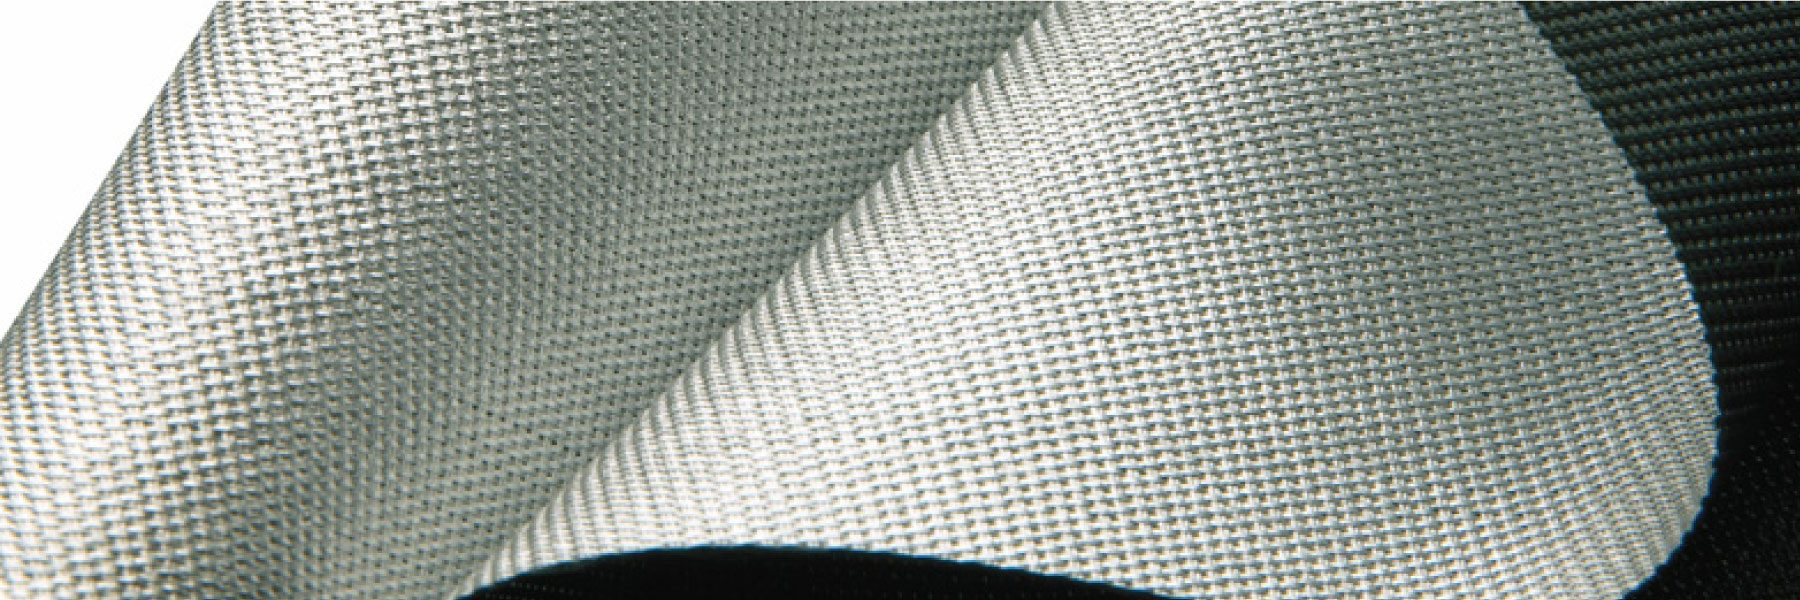 Specialist Screen Fabrics - Guthrie Douglas